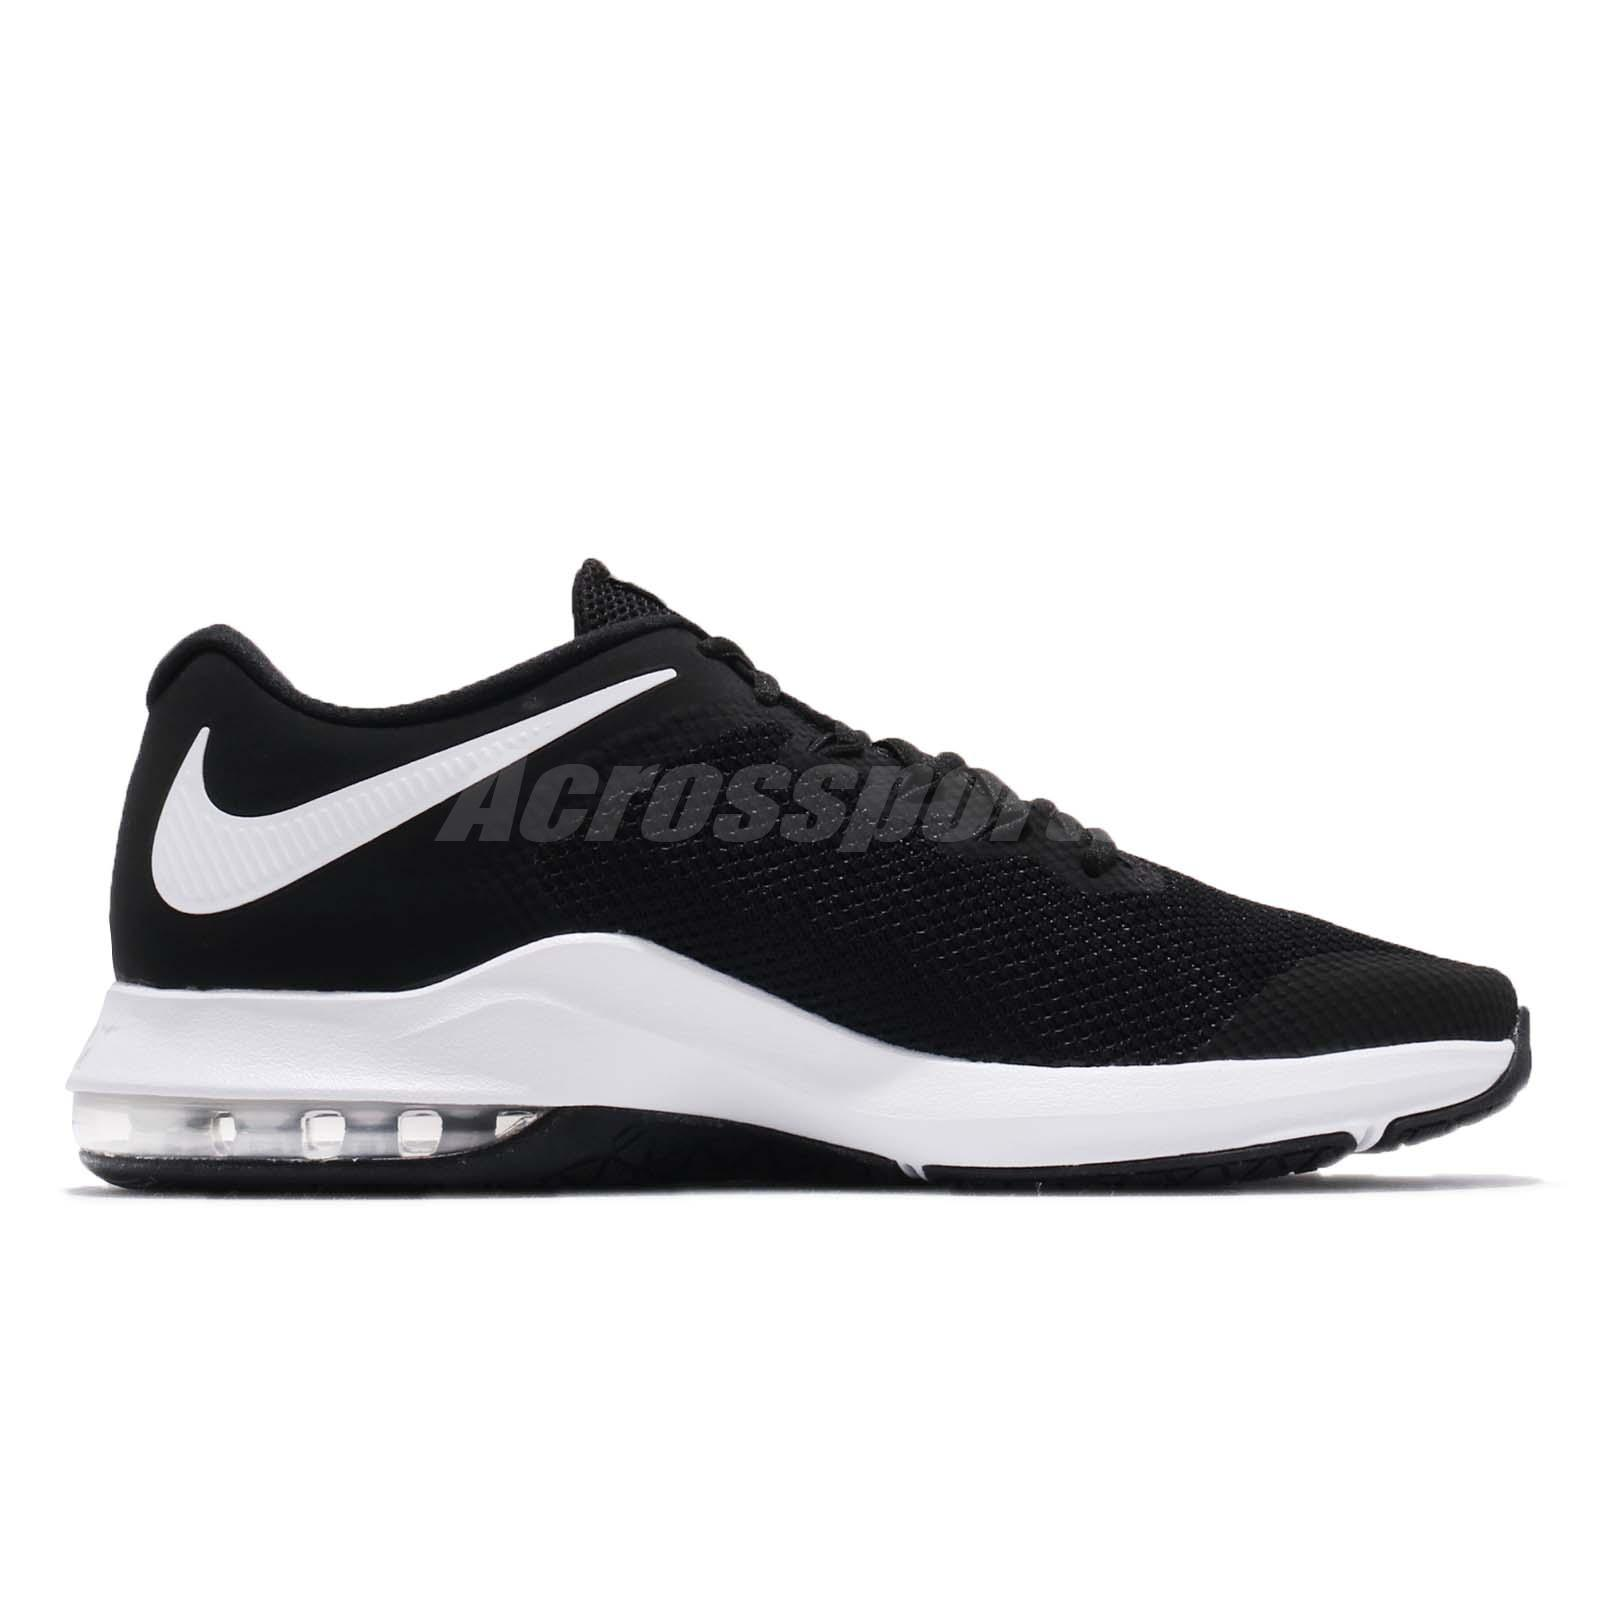 3aa61b385ae8 Nike Air Max Alpha Trainer Black White Men Cross Training Shoes ...